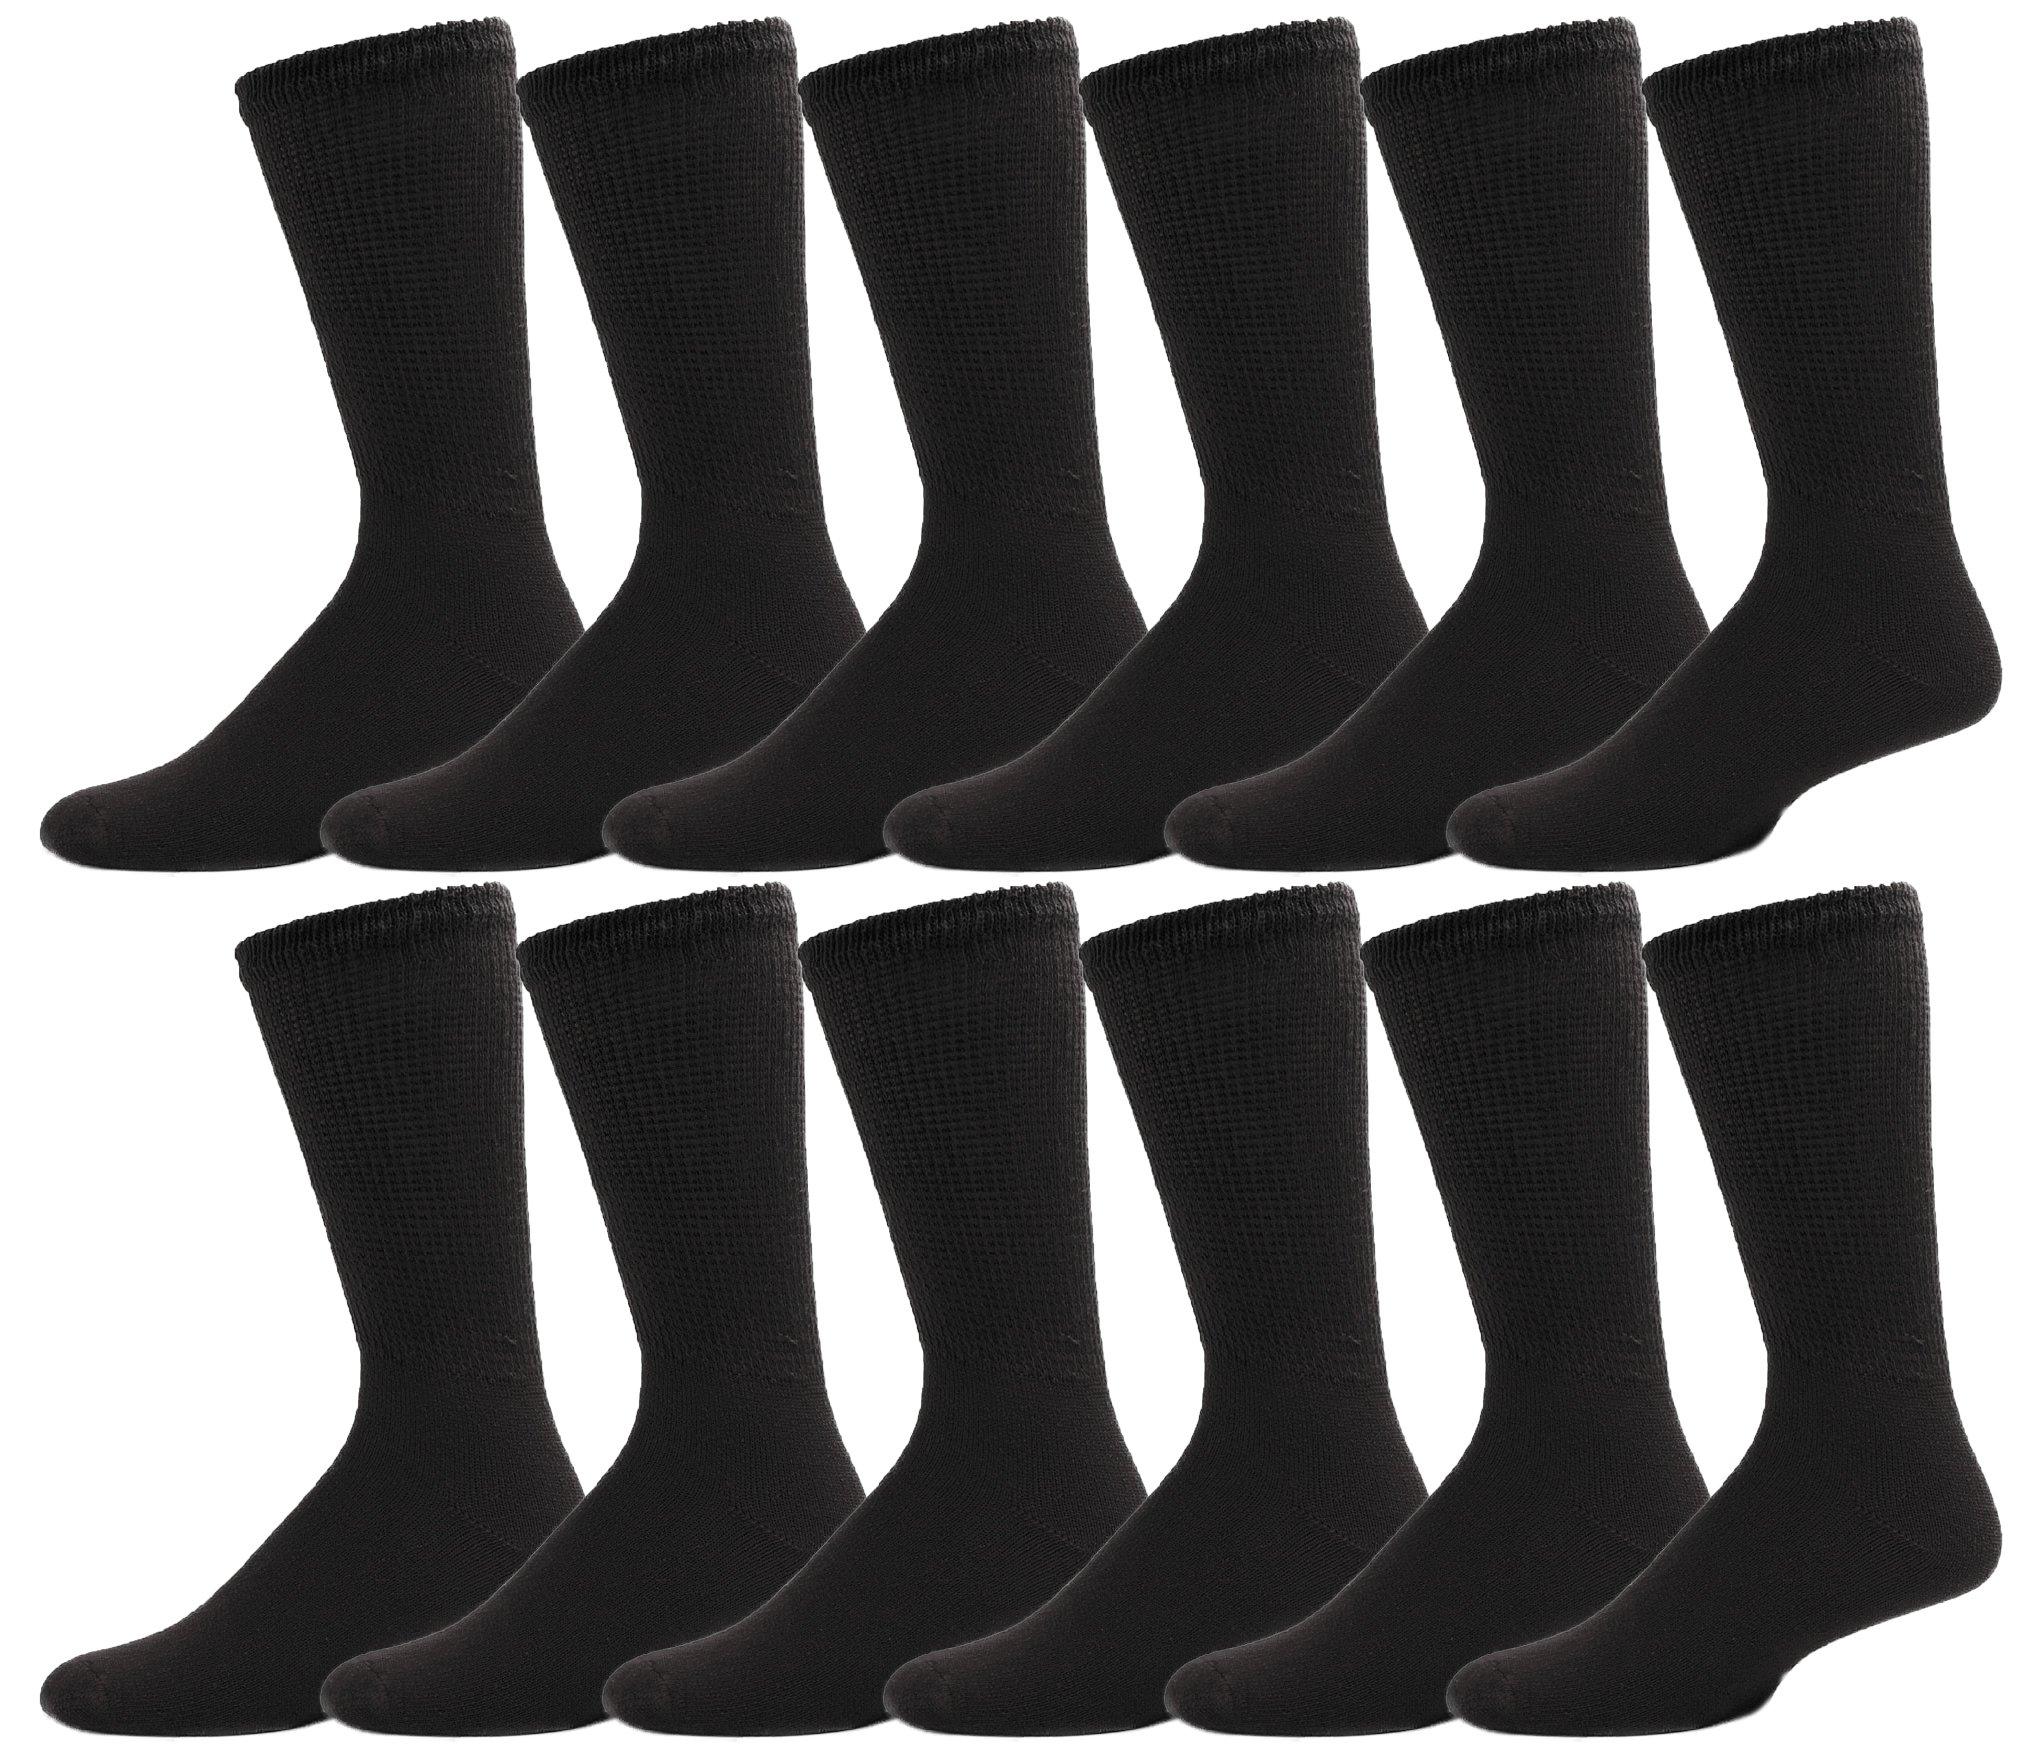 12 Pairs Diabetic Socks for Women, Non Binding Cotton Sock, Promotes Blood Circulation, Bulk Pack Ladies (Black)